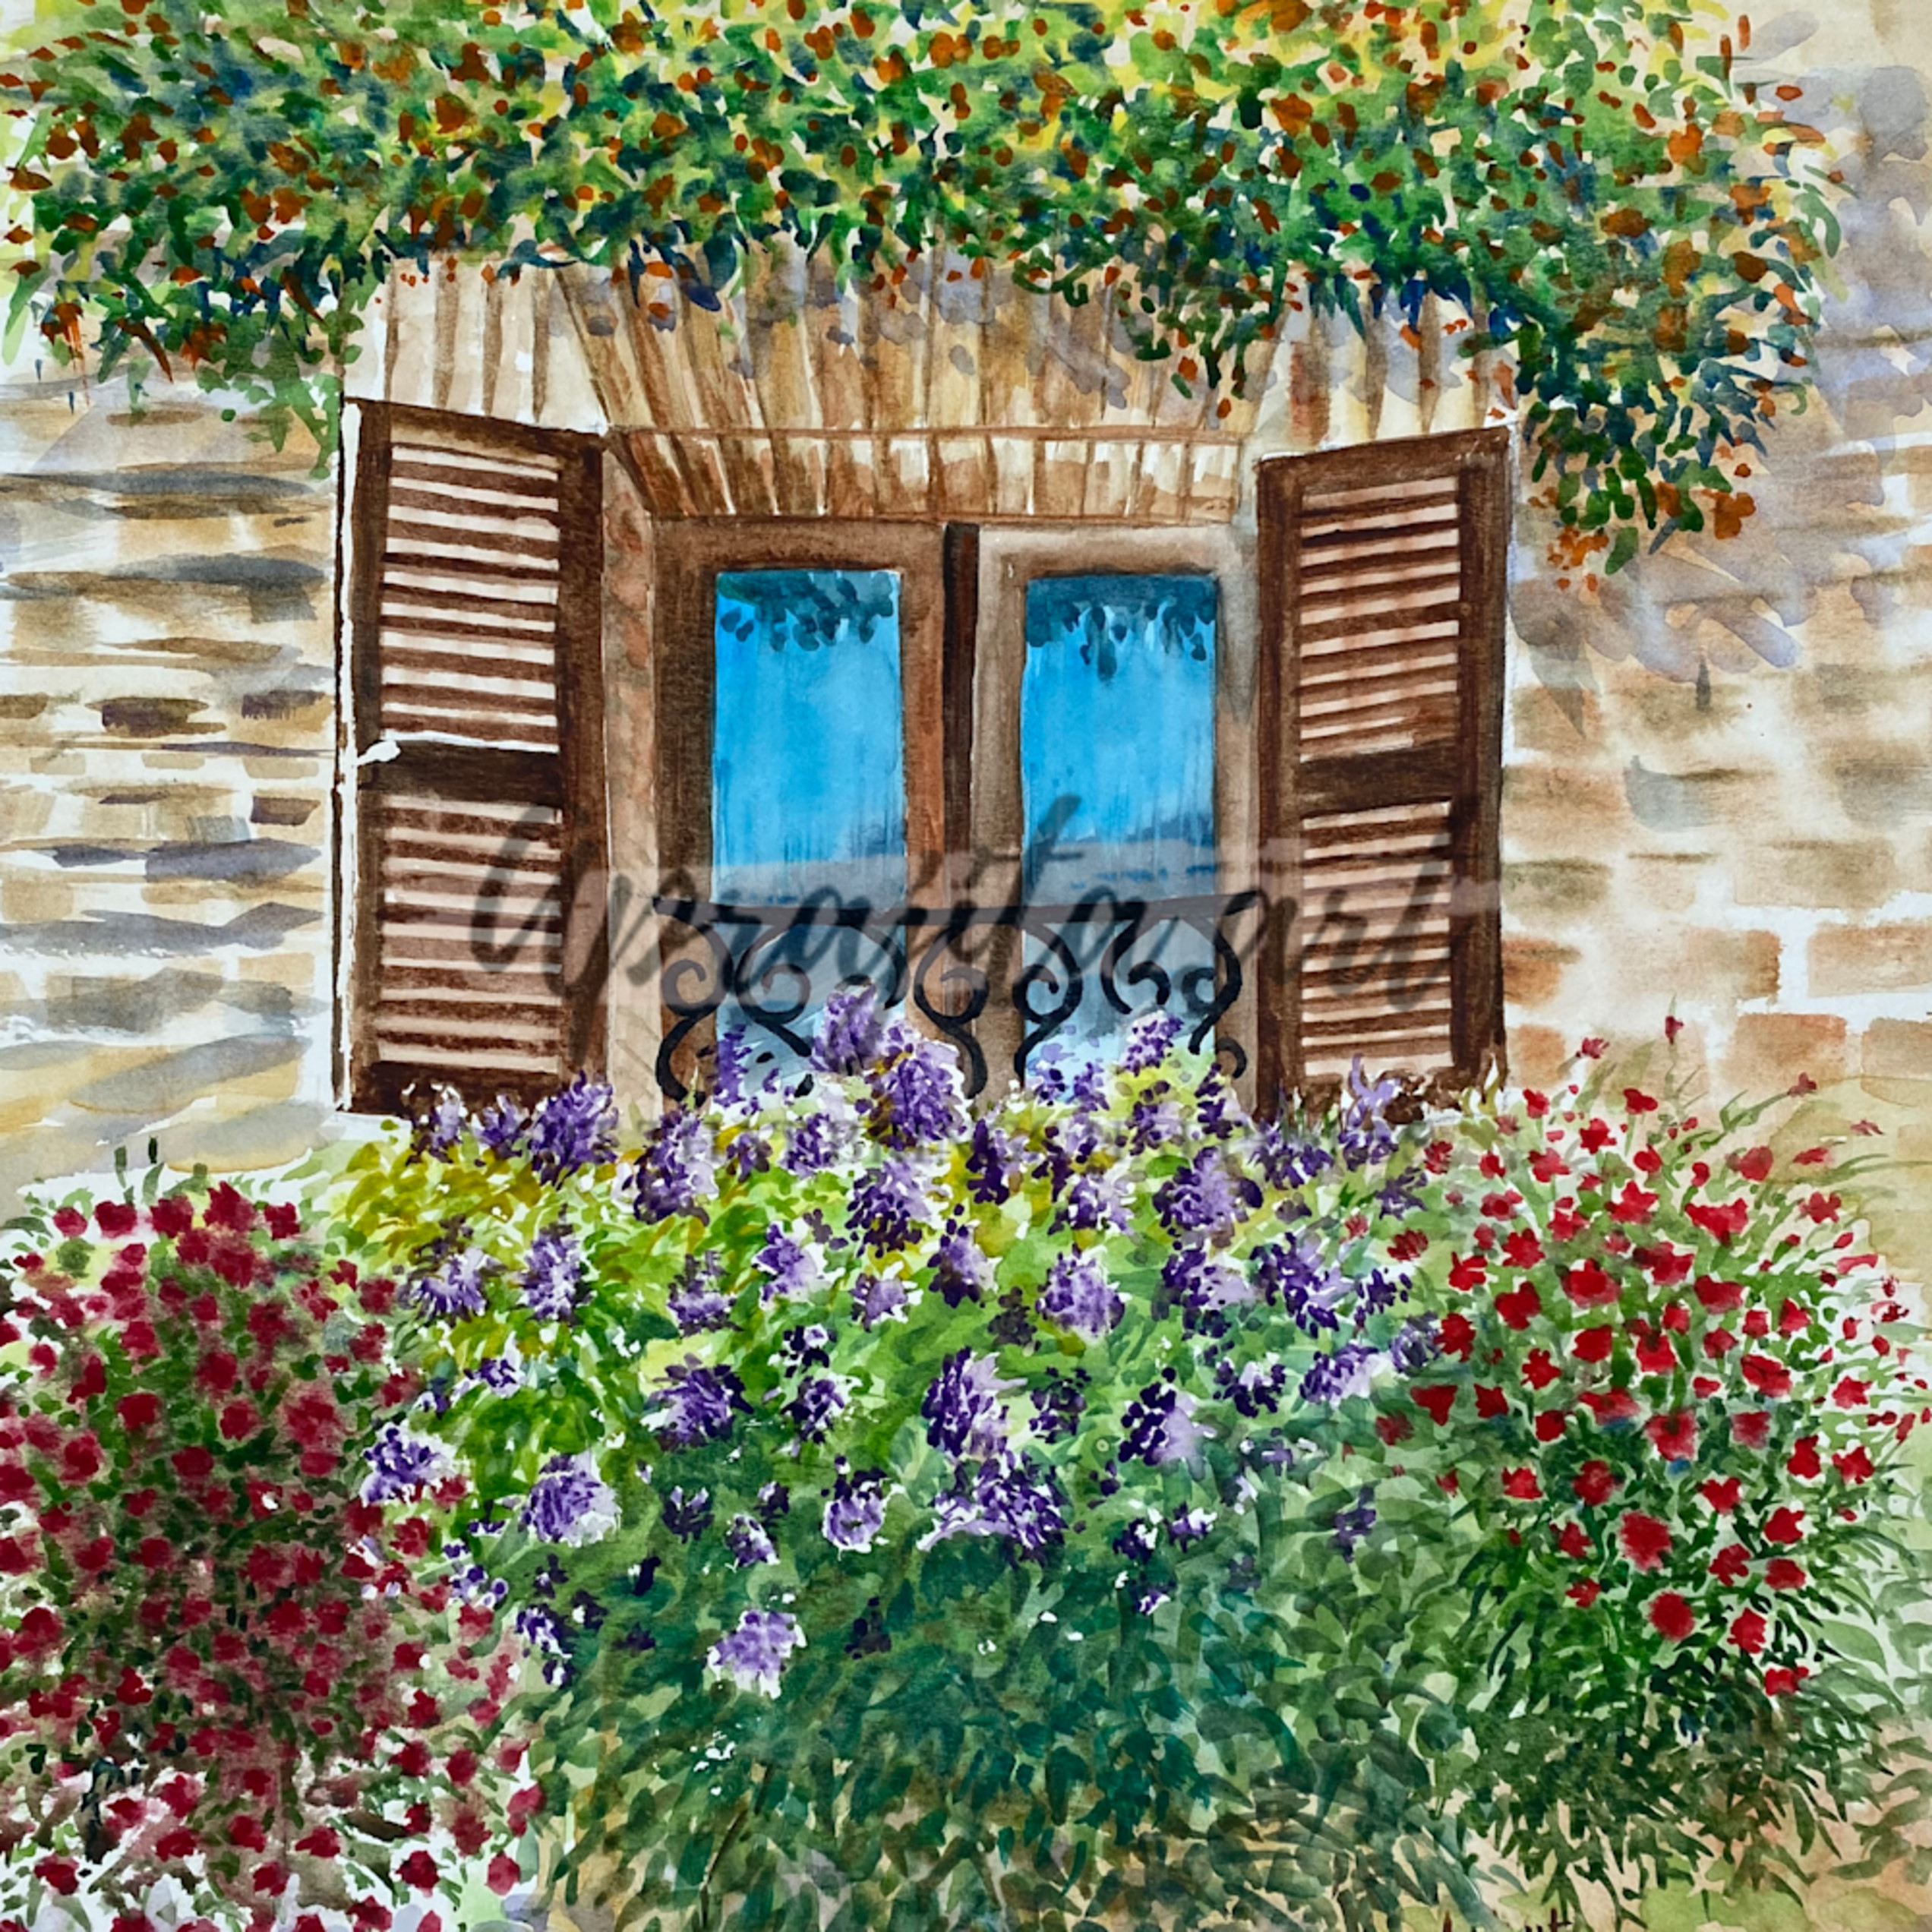 The open window bntdes